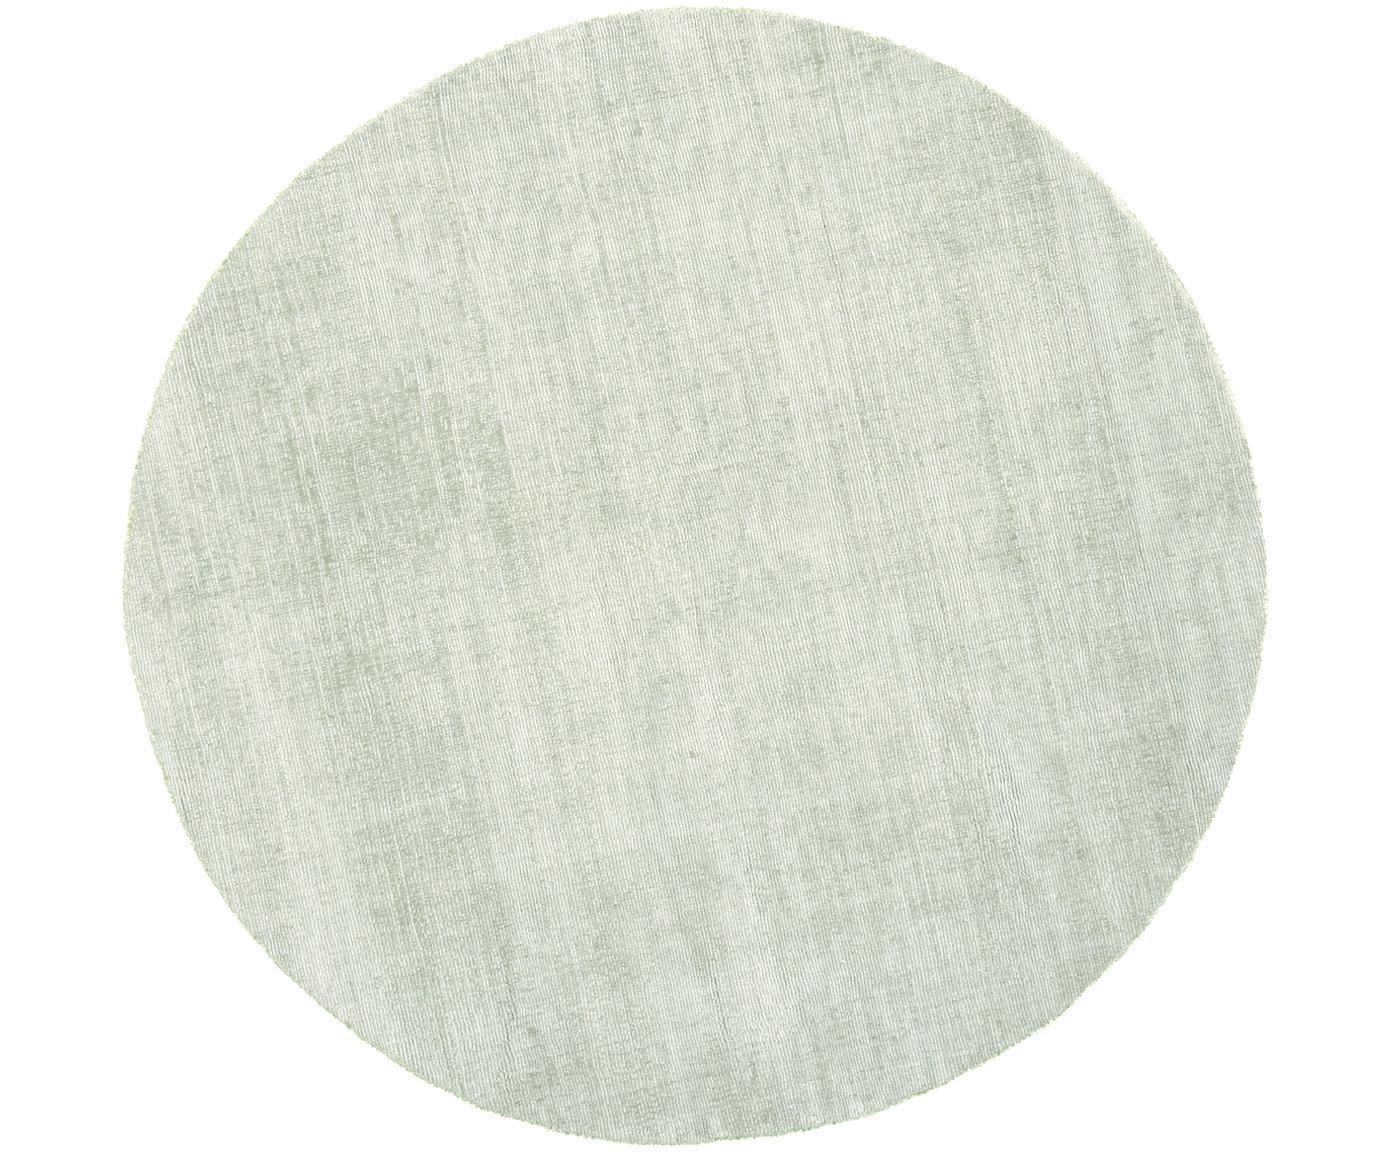 Alfombra redonda artesanal de viscosa Jane, Parte superior: 100%viscosa, Reverso: 100%algodón, Verde menta, Ø 120 cm (Tamaño S)